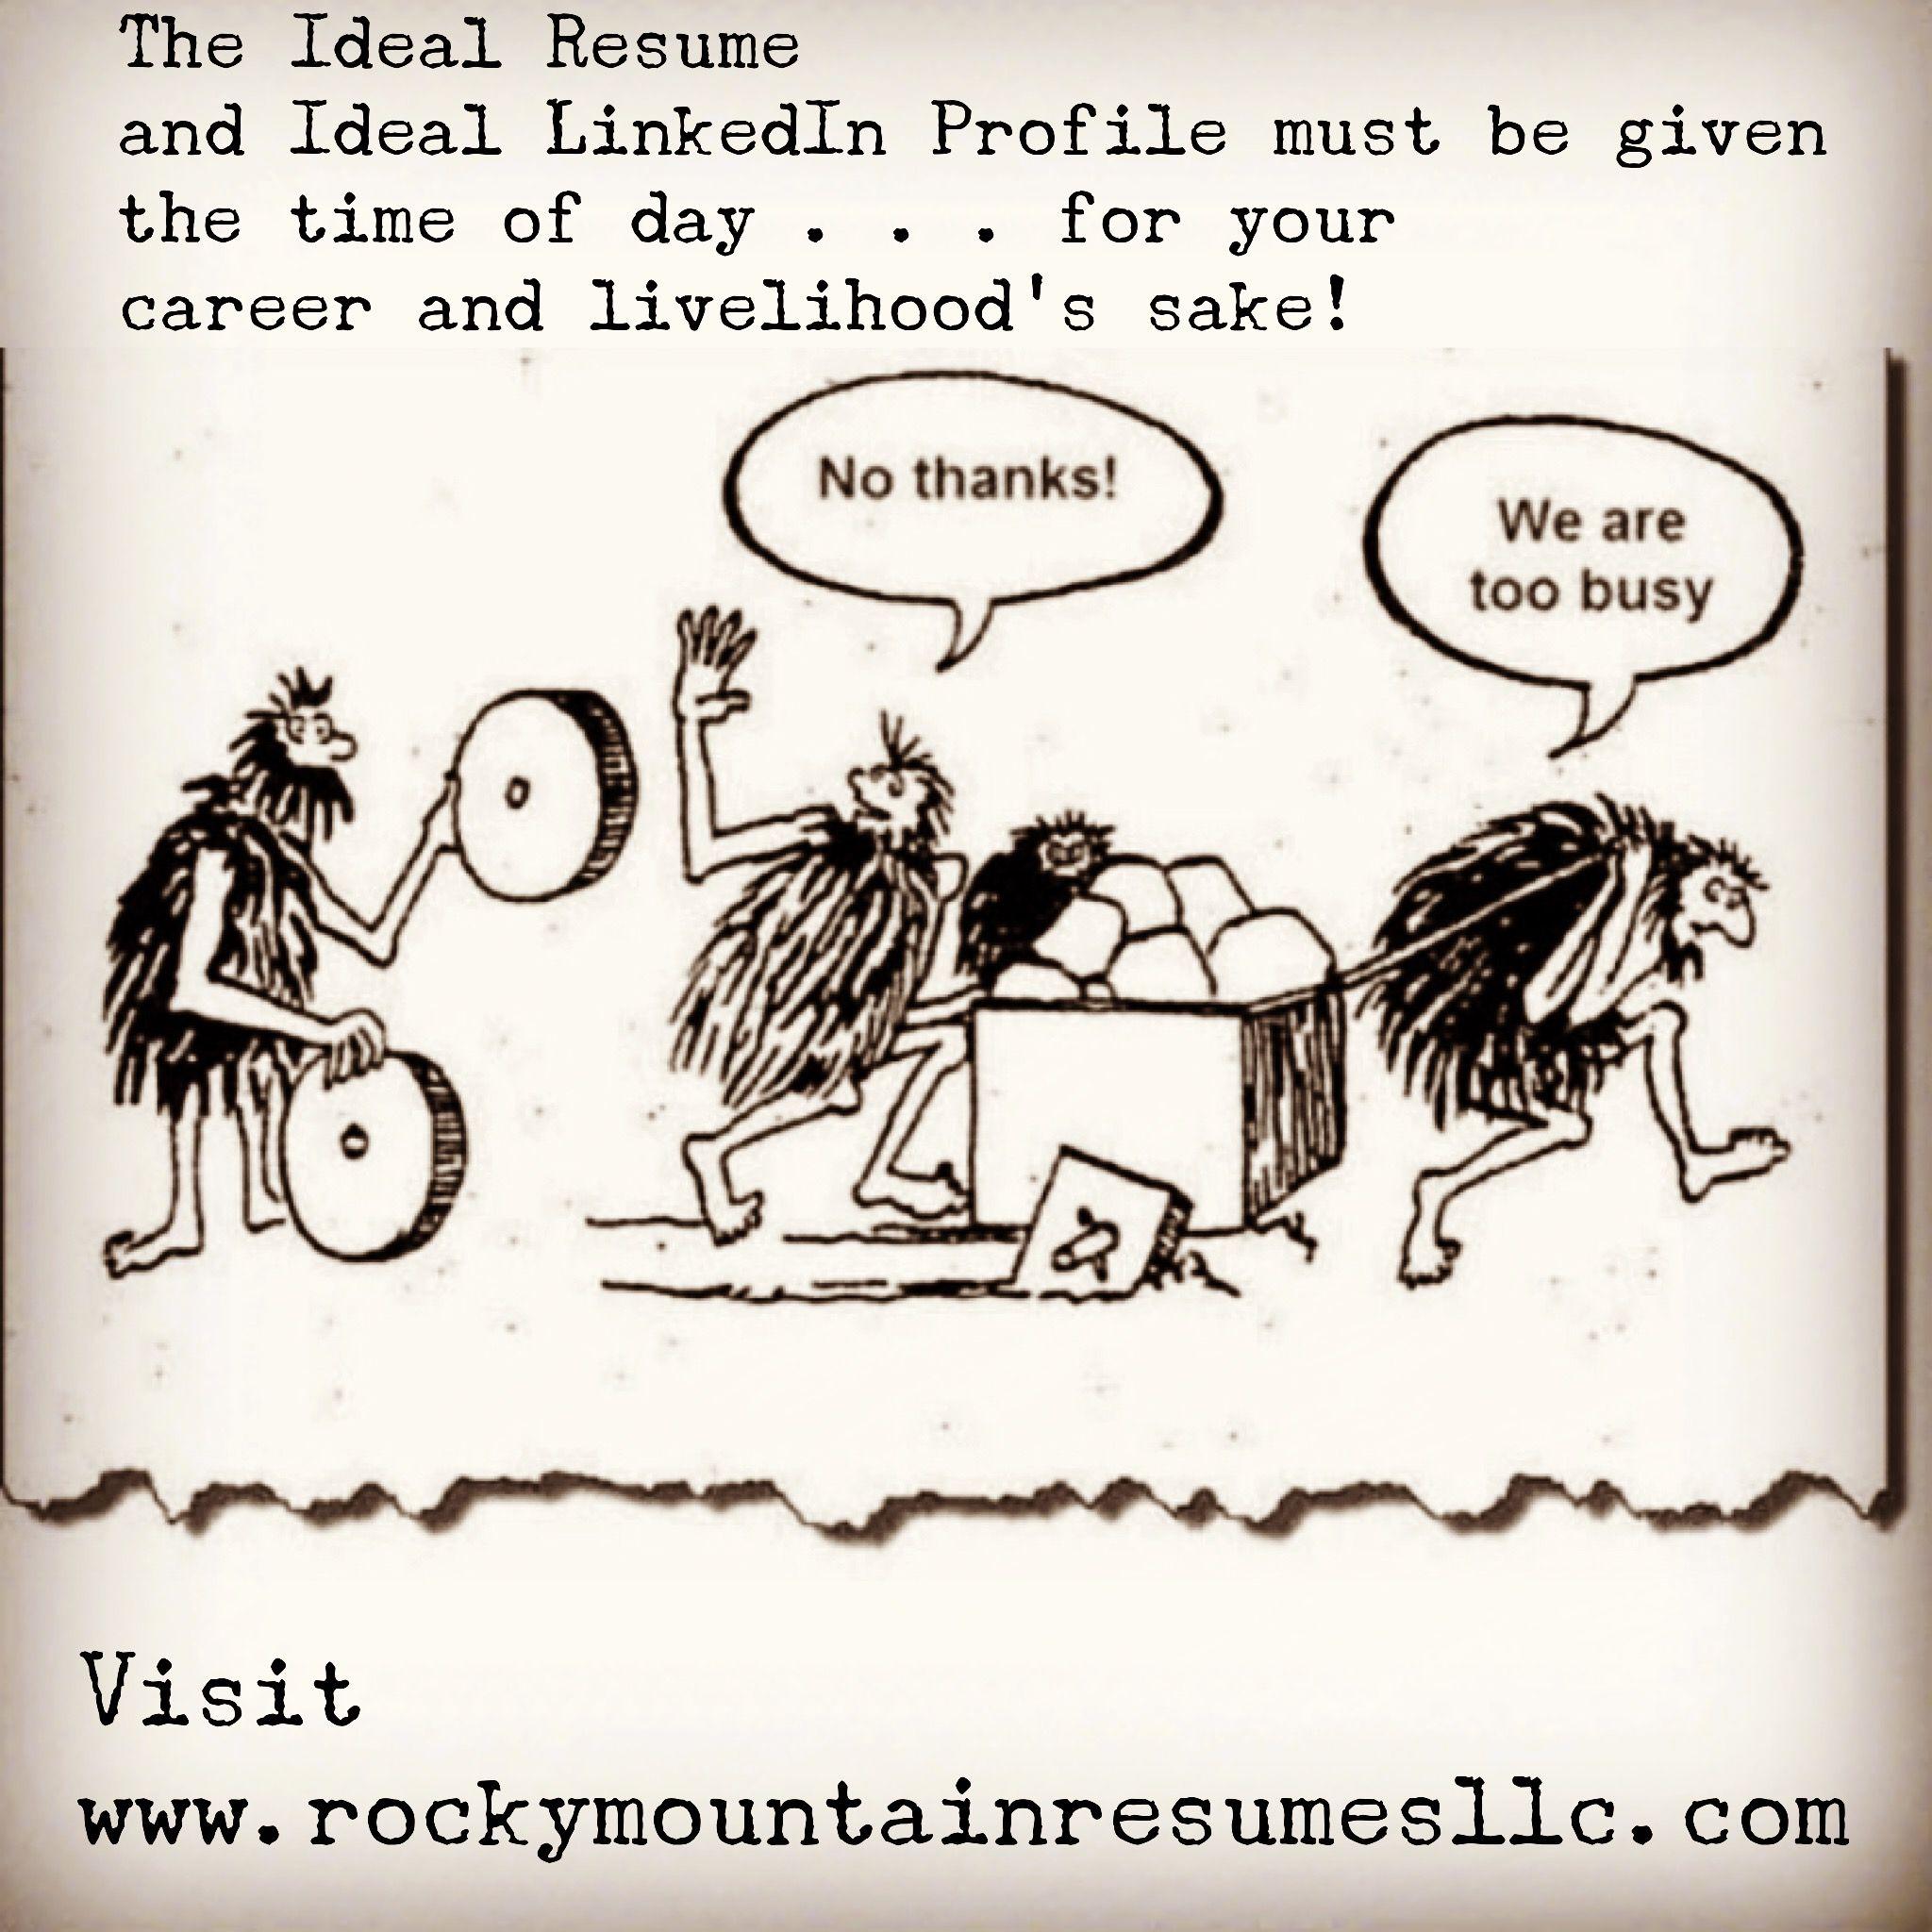 Job Career Resume Hiring Linkedin Follow Rocky Mountain Resumes